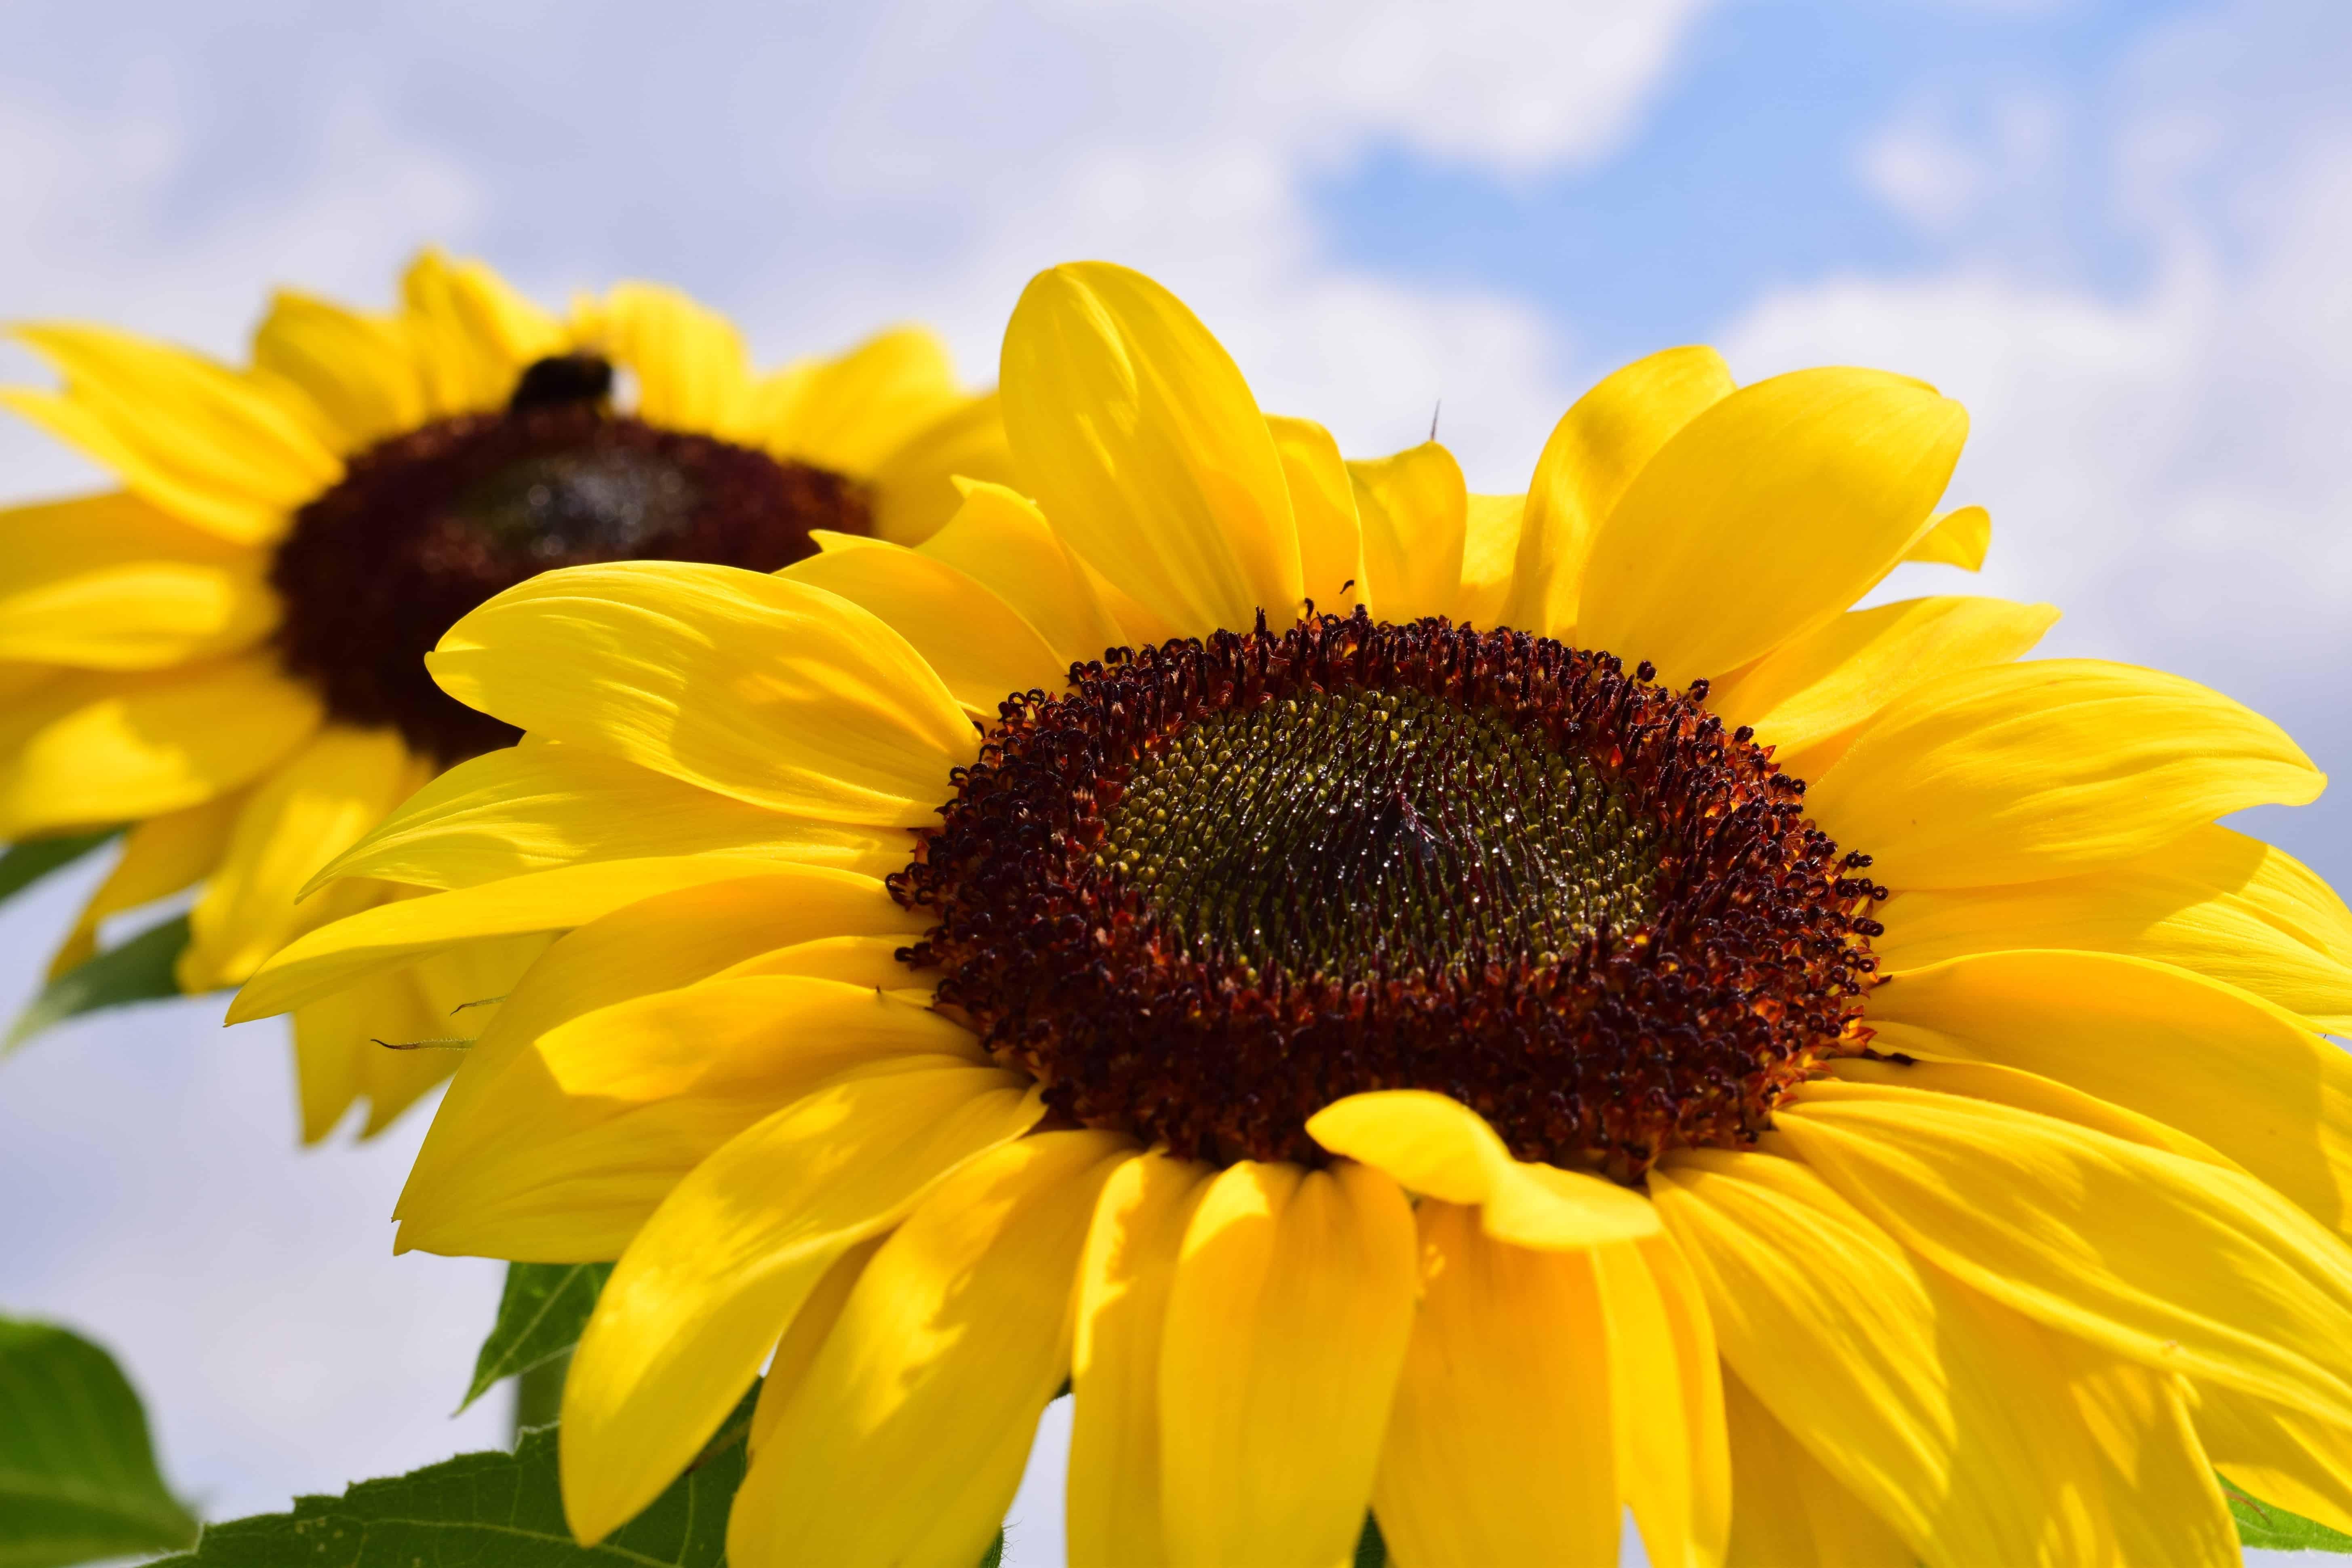 Kostenlose Bild: Sonnenblume, Blume, Pflanze, Blütenblatt